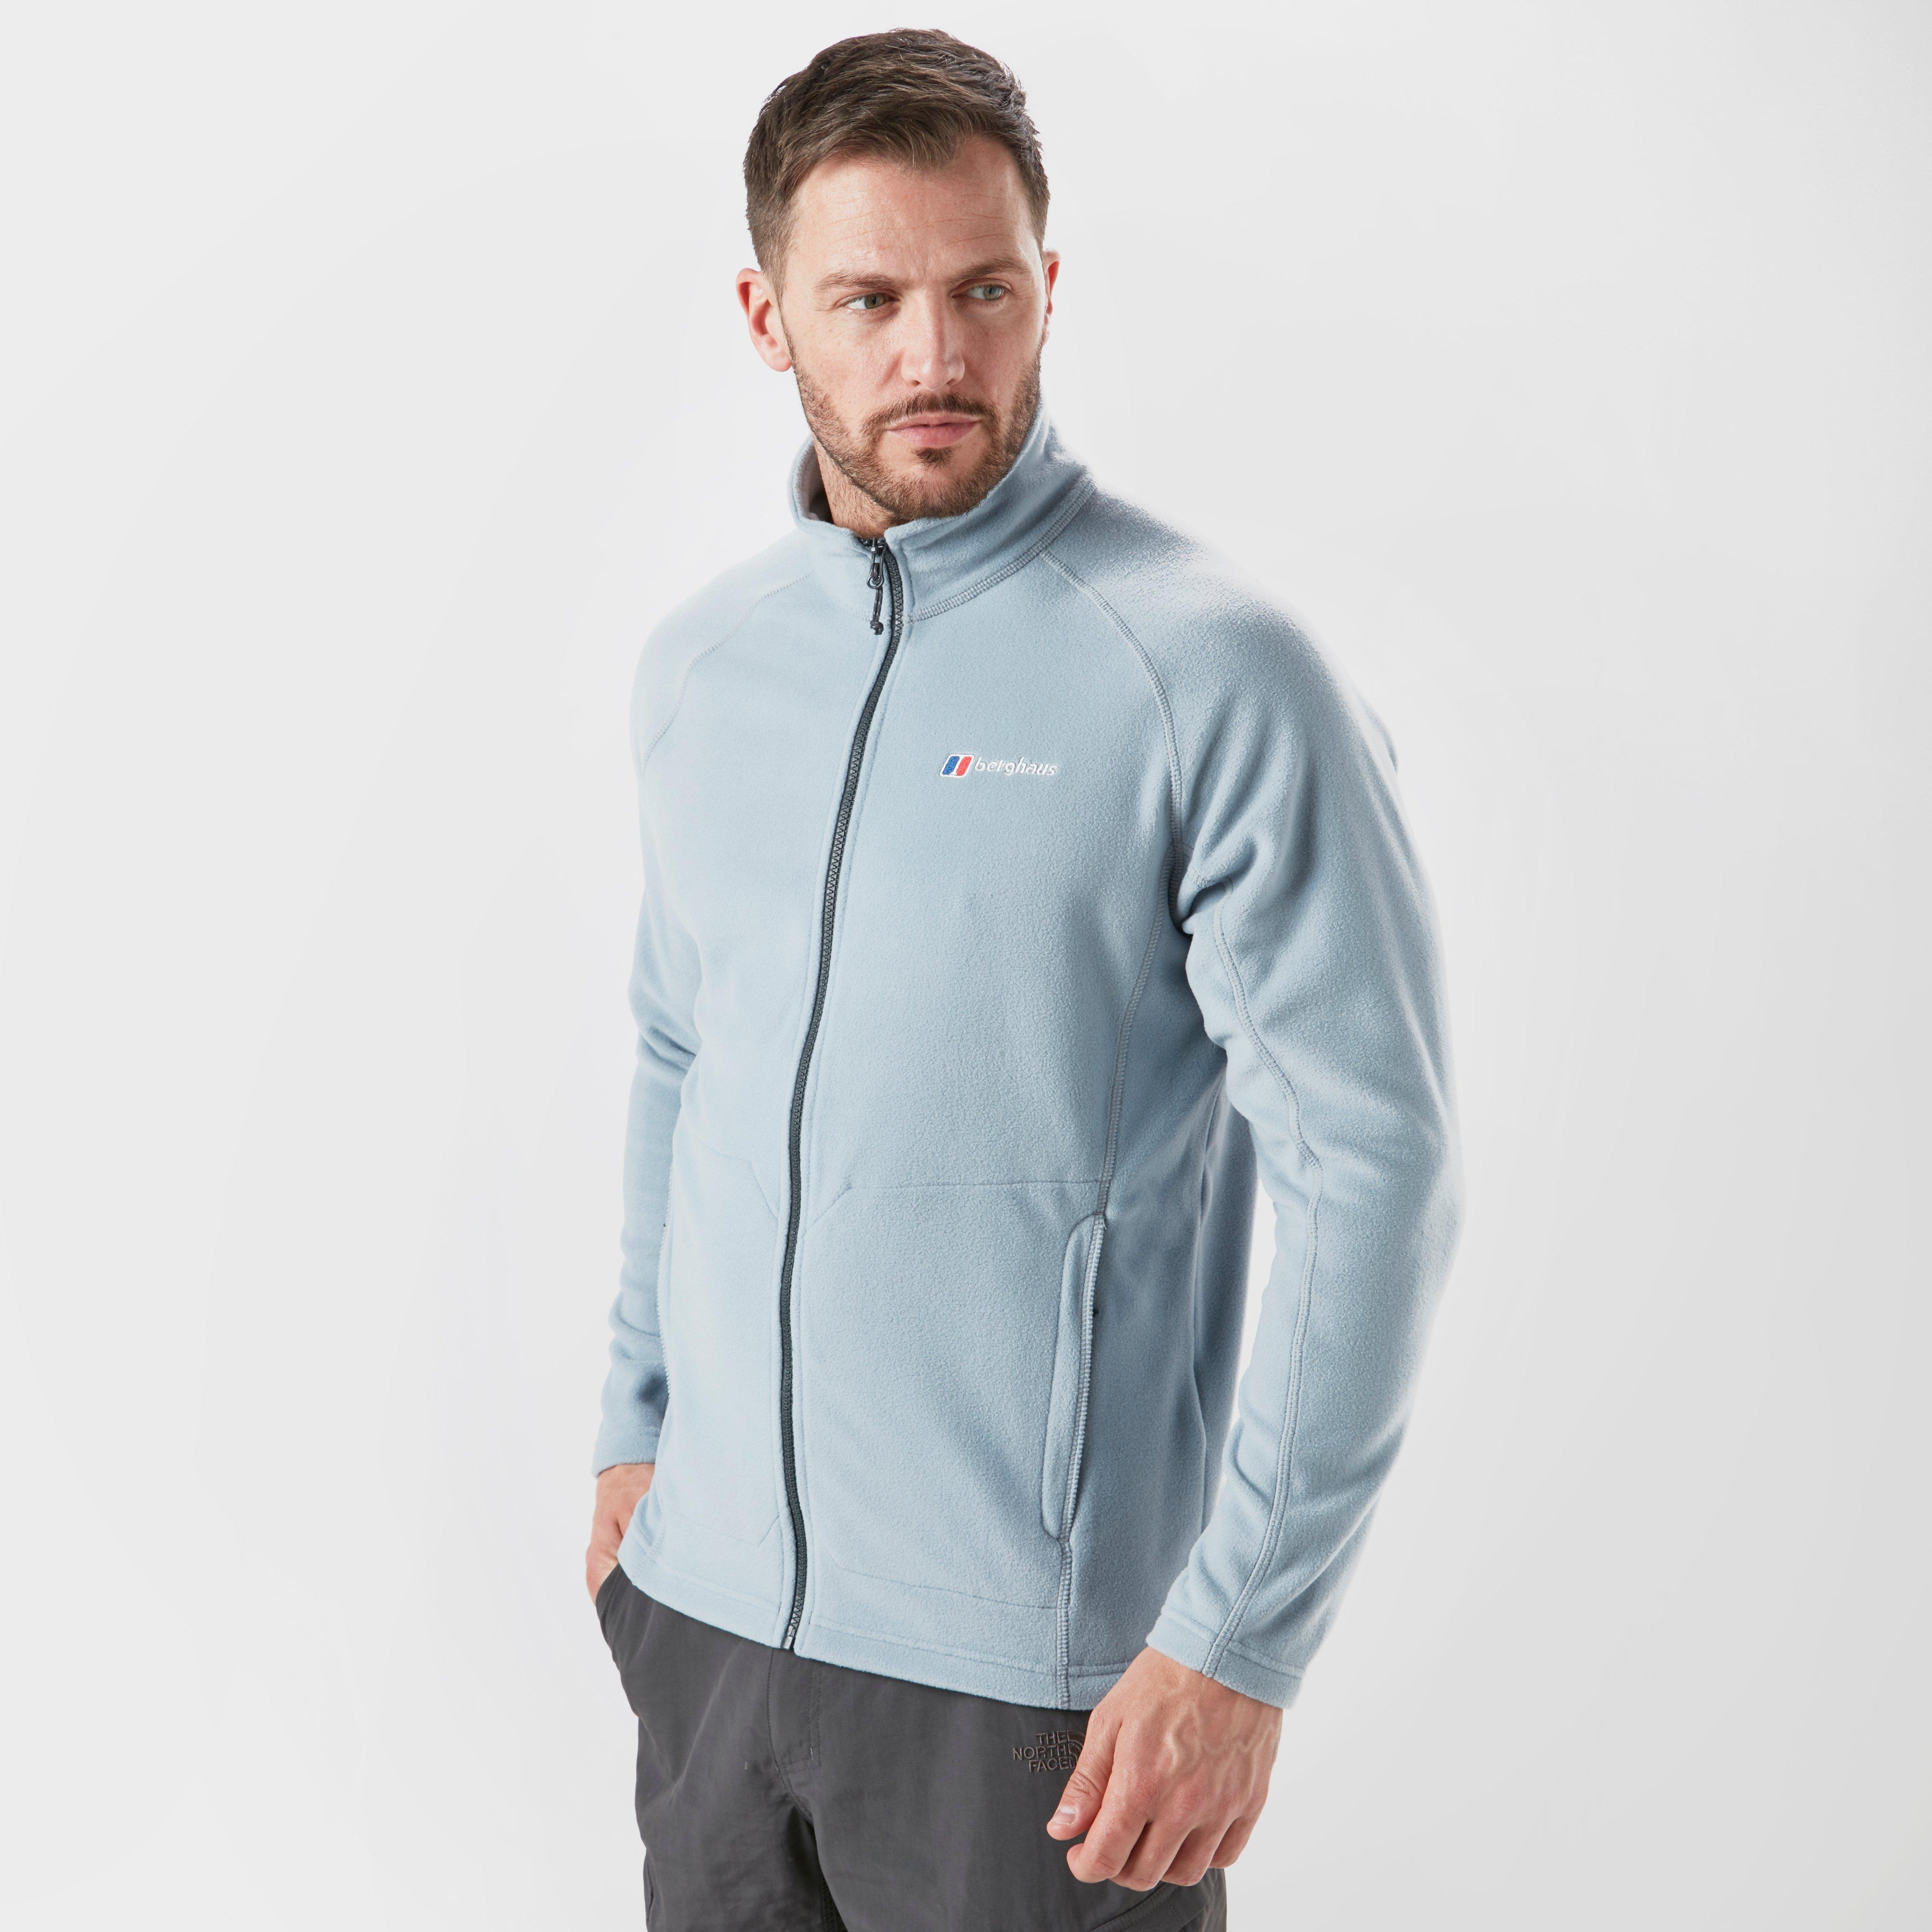 Berghaus Mens Caldey Fleece Jacket...RRP £75!!